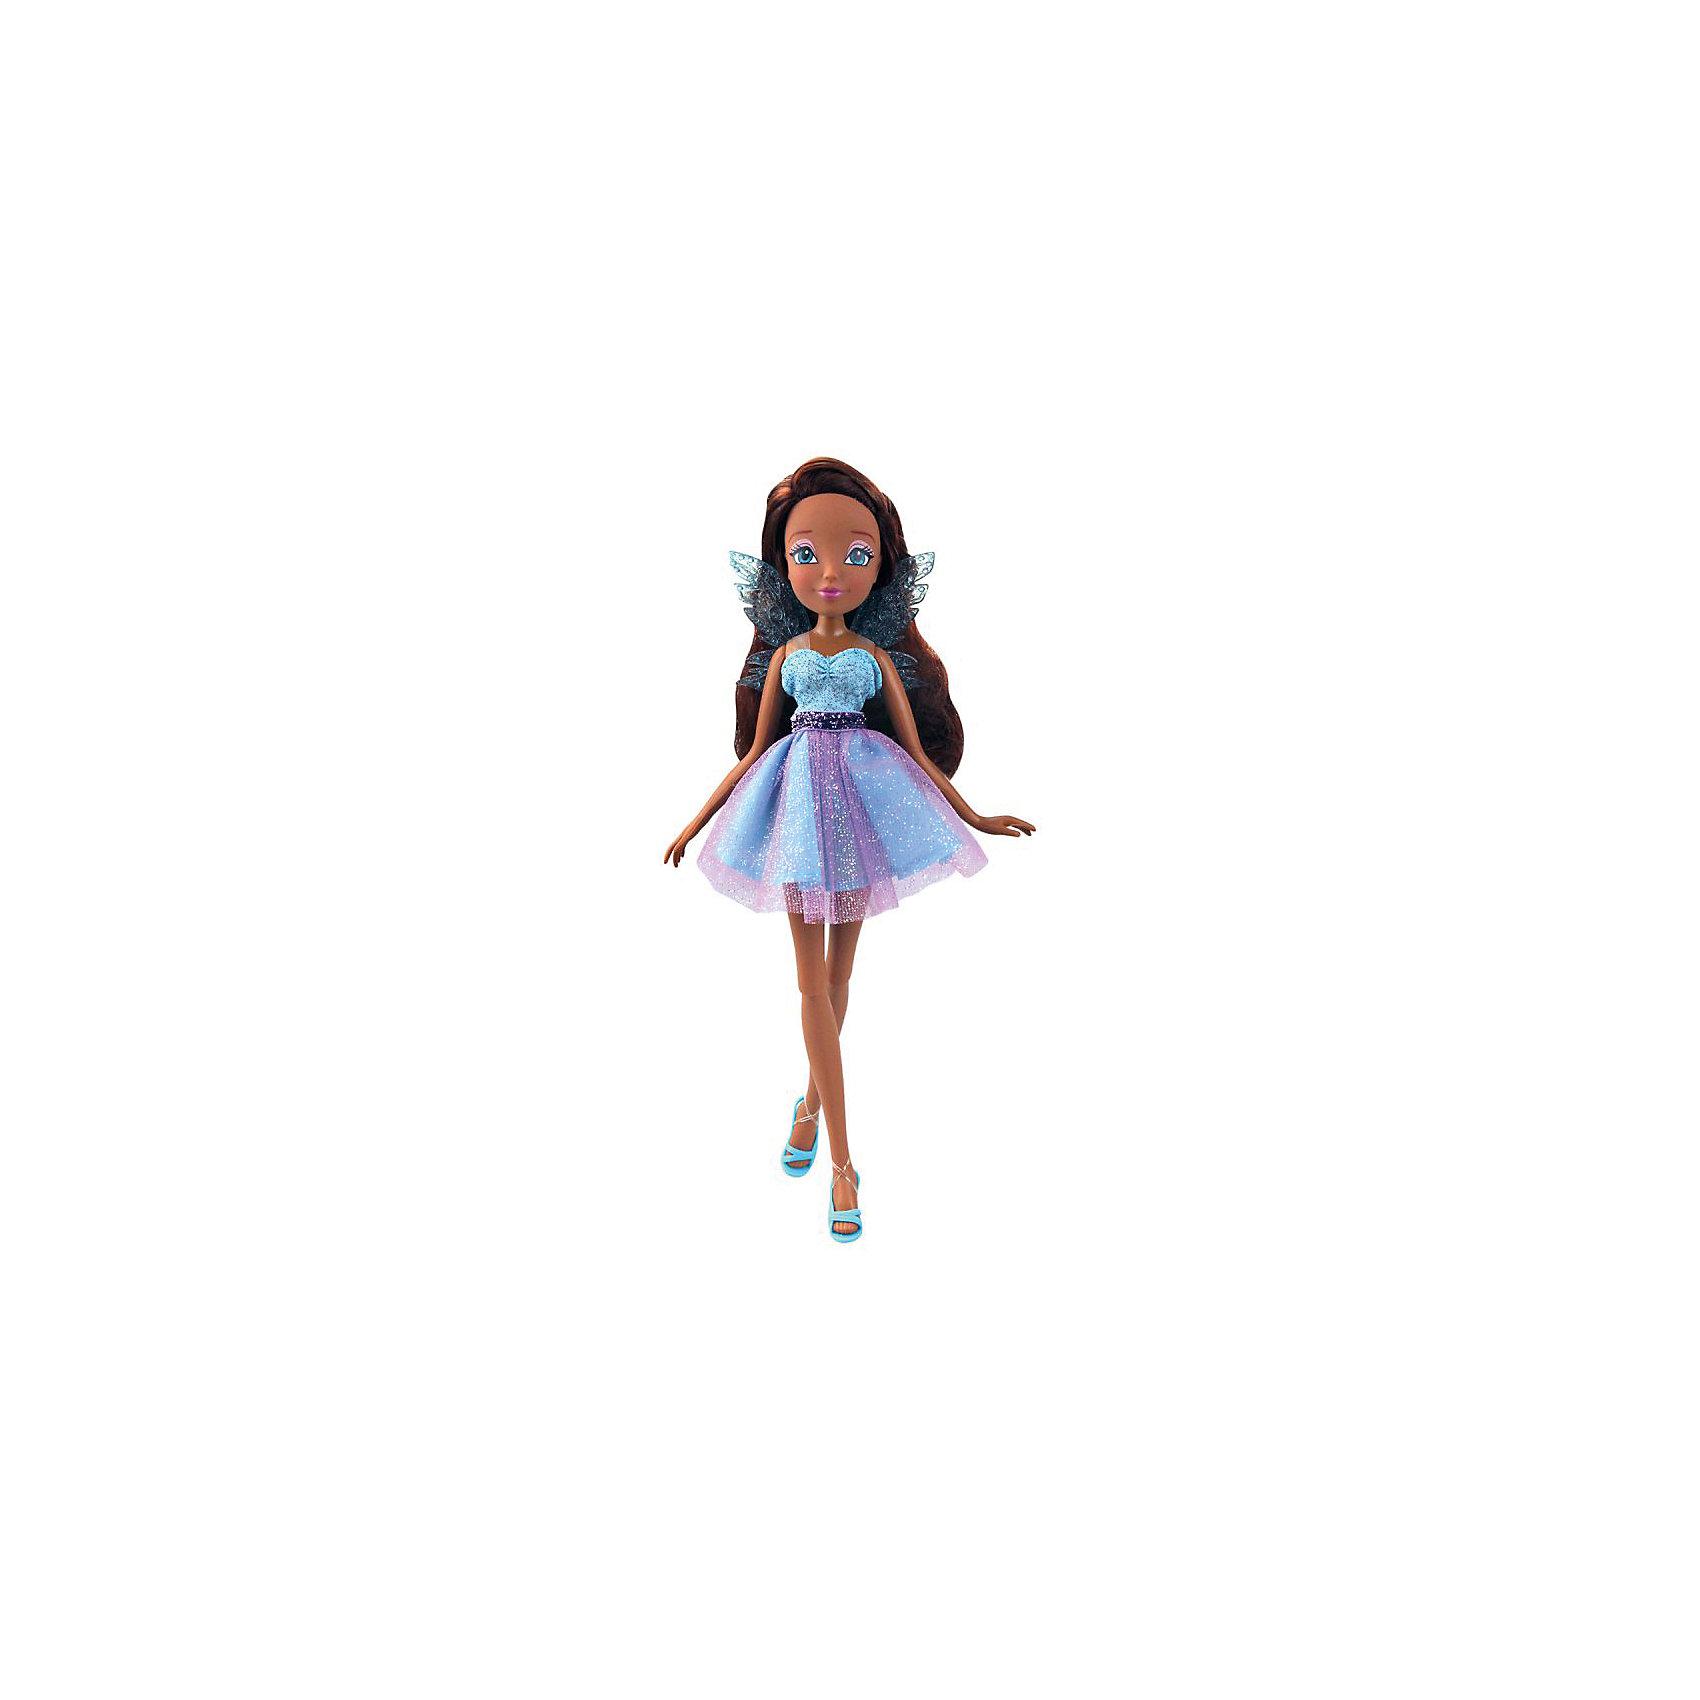 Кукла Winx Club Мода и магия-4 Лайла, 31,5 смПопулярные игрушки<br><br><br>Ширина мм: 130<br>Глубина мм: 60<br>Высота мм: 315<br>Вес г: 225<br>Возраст от месяцев: 36<br>Возраст до месяцев: 120<br>Пол: Женский<br>Возраст: Детский<br>SKU: 7097666